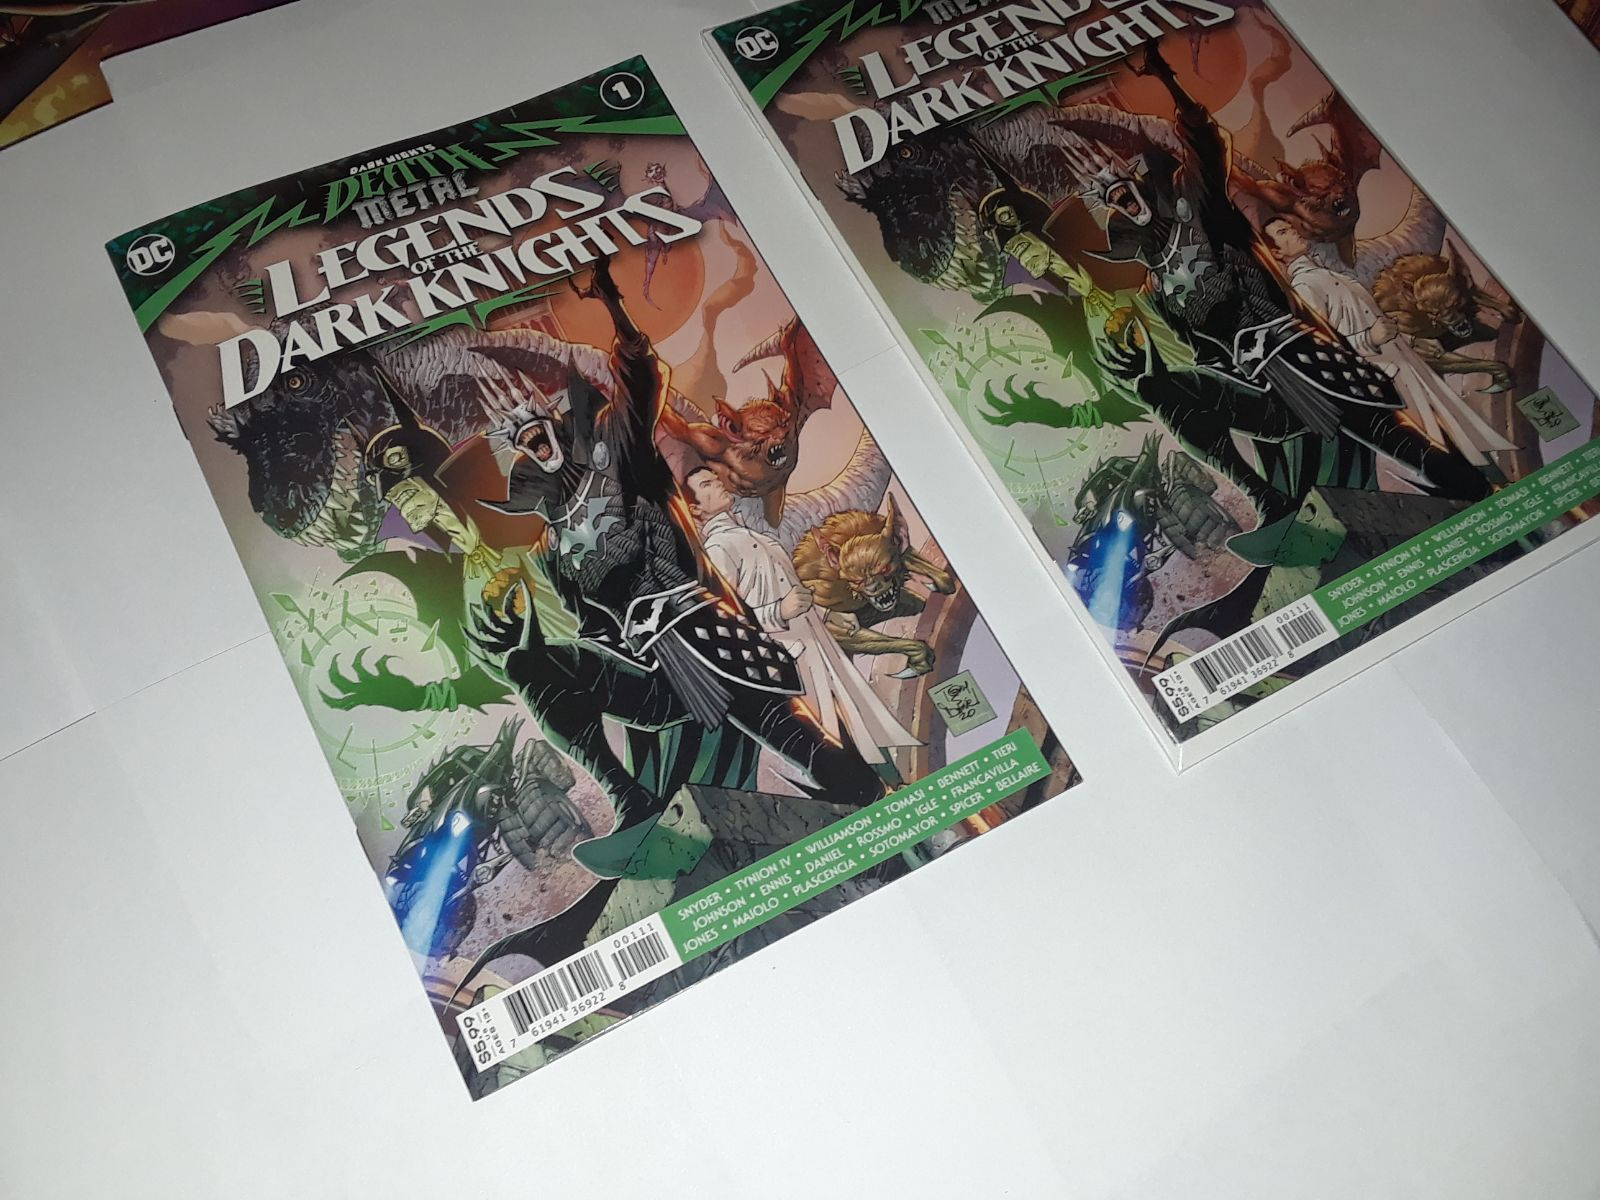 Legends of the Dark Knights Death Metal